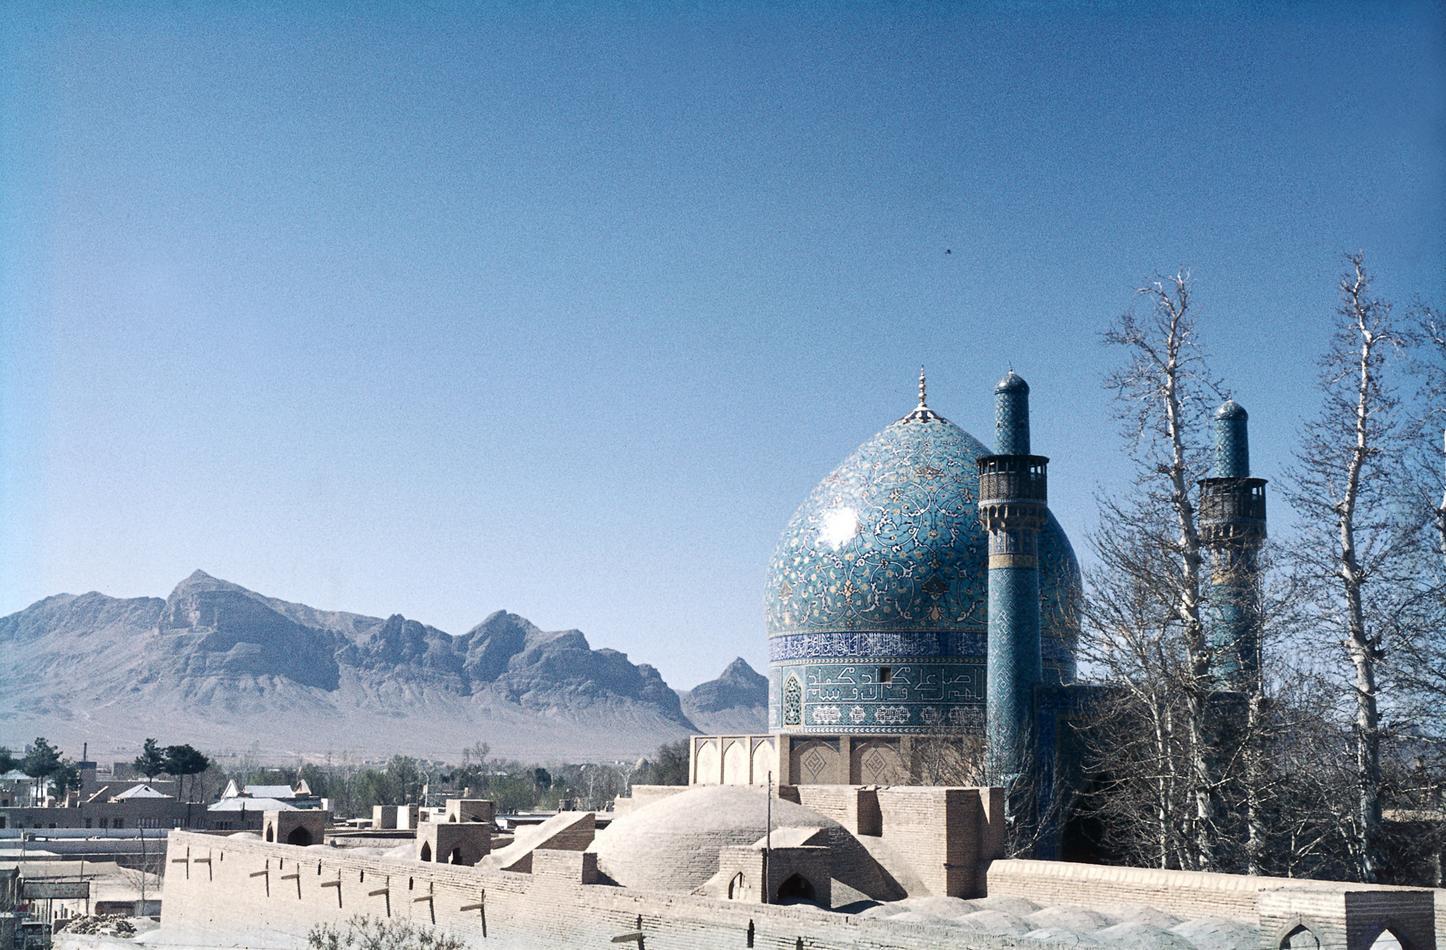 1714Madar-i-Shah-madrasaen-_Chahar-Bagh-madrasaen__-kIsfahan_-Iran.-HMH.jpg